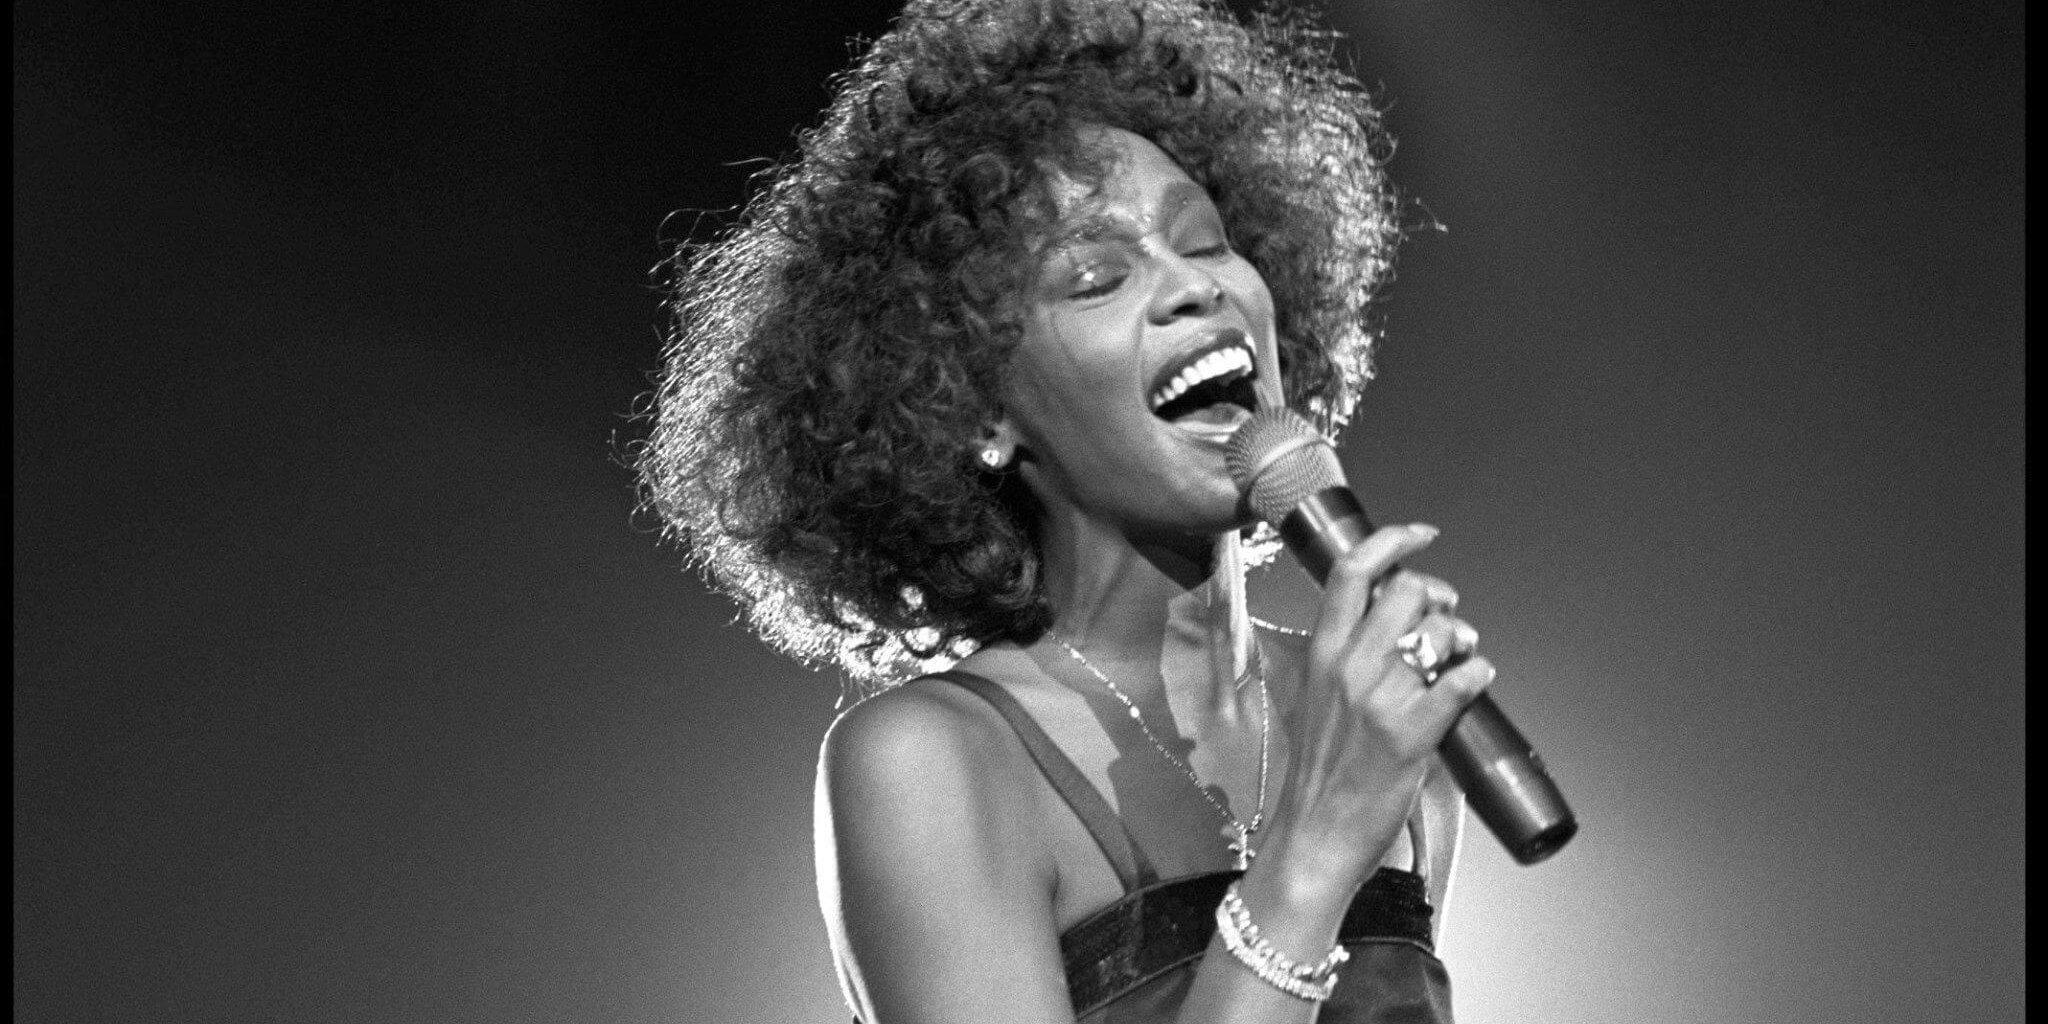 La película de la vida de Whitney Houston ya está en camino